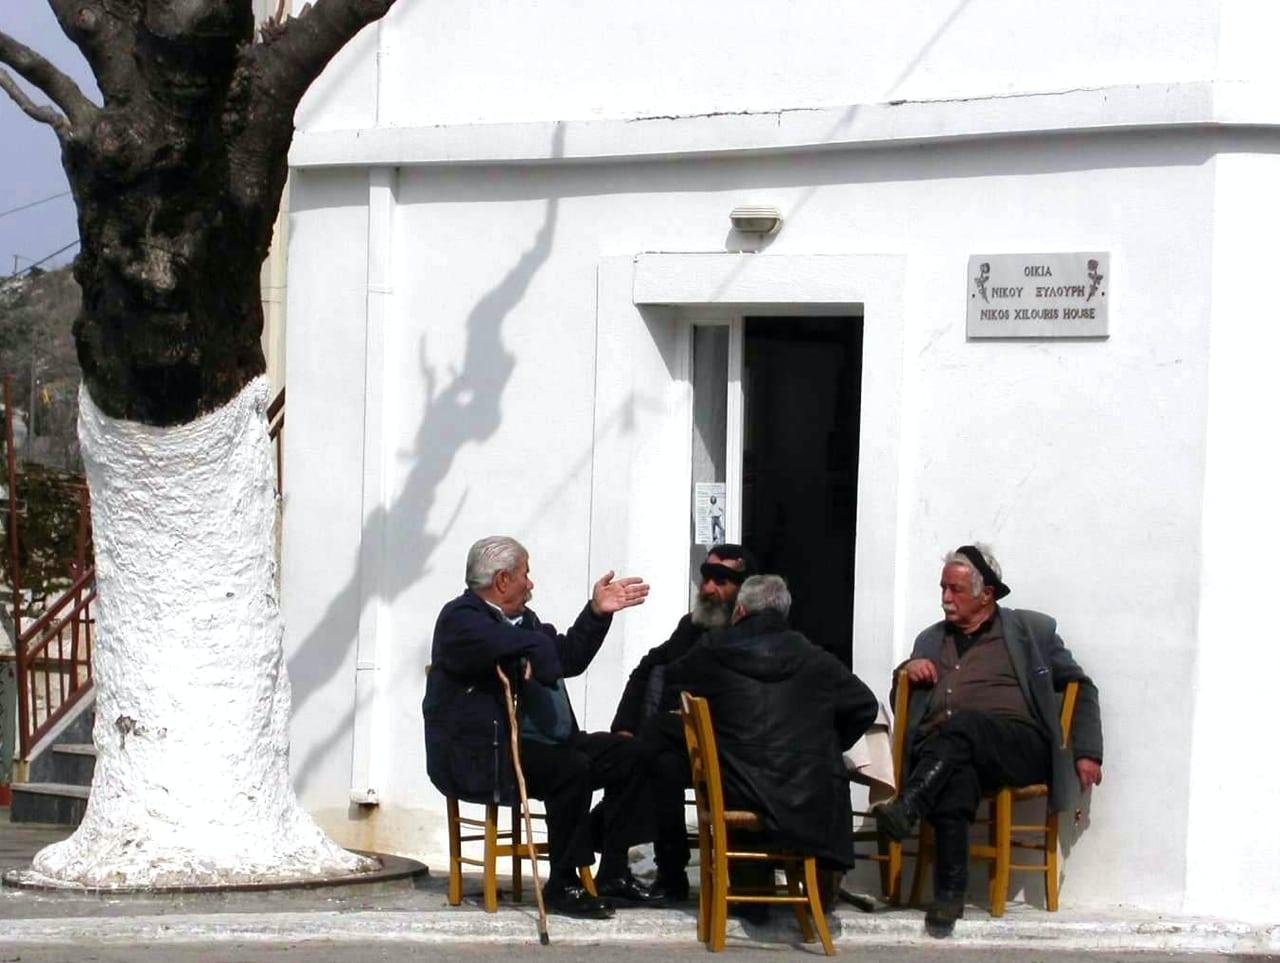 local people anogia village, Anogia Village Rethimno Crete, anogia village travel guide, anogia village things to do, anogia gastronomy, anogia village music